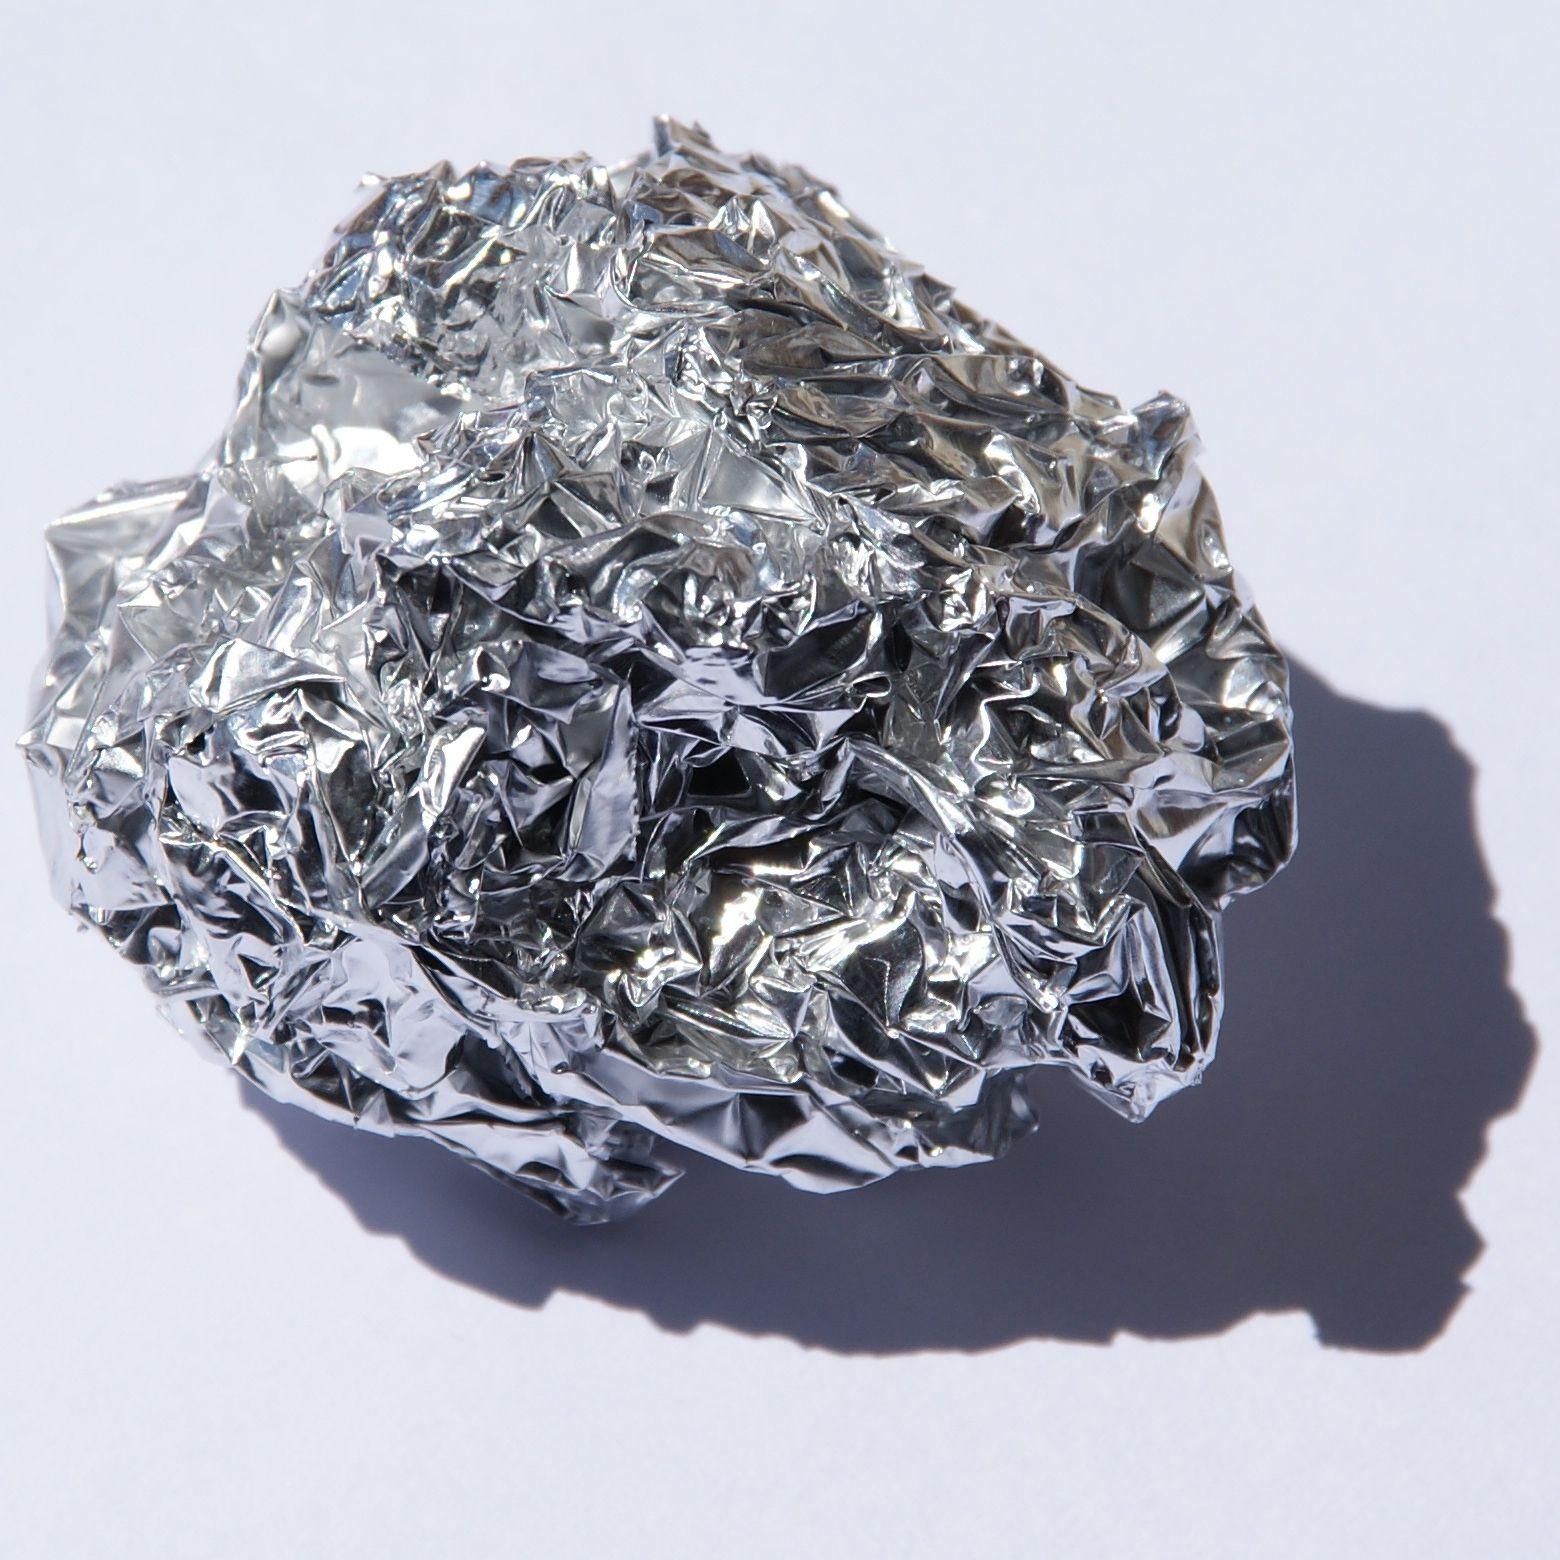 hauchdünne Aluminiumfolie